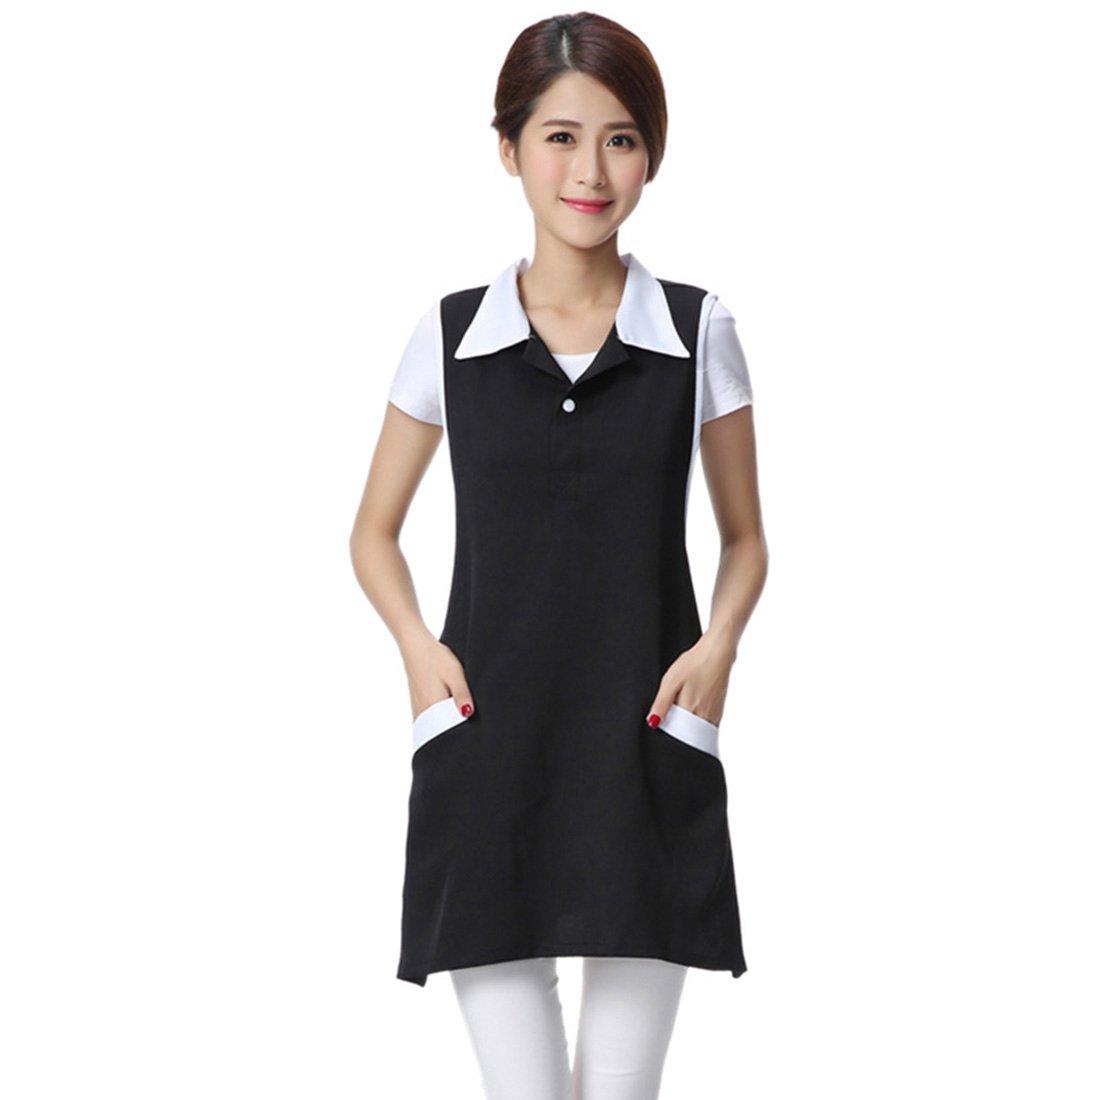 Jiyaru Women Sleeveless Workwear Lady Working Apron Dress Waiter Hotel Uniform Black